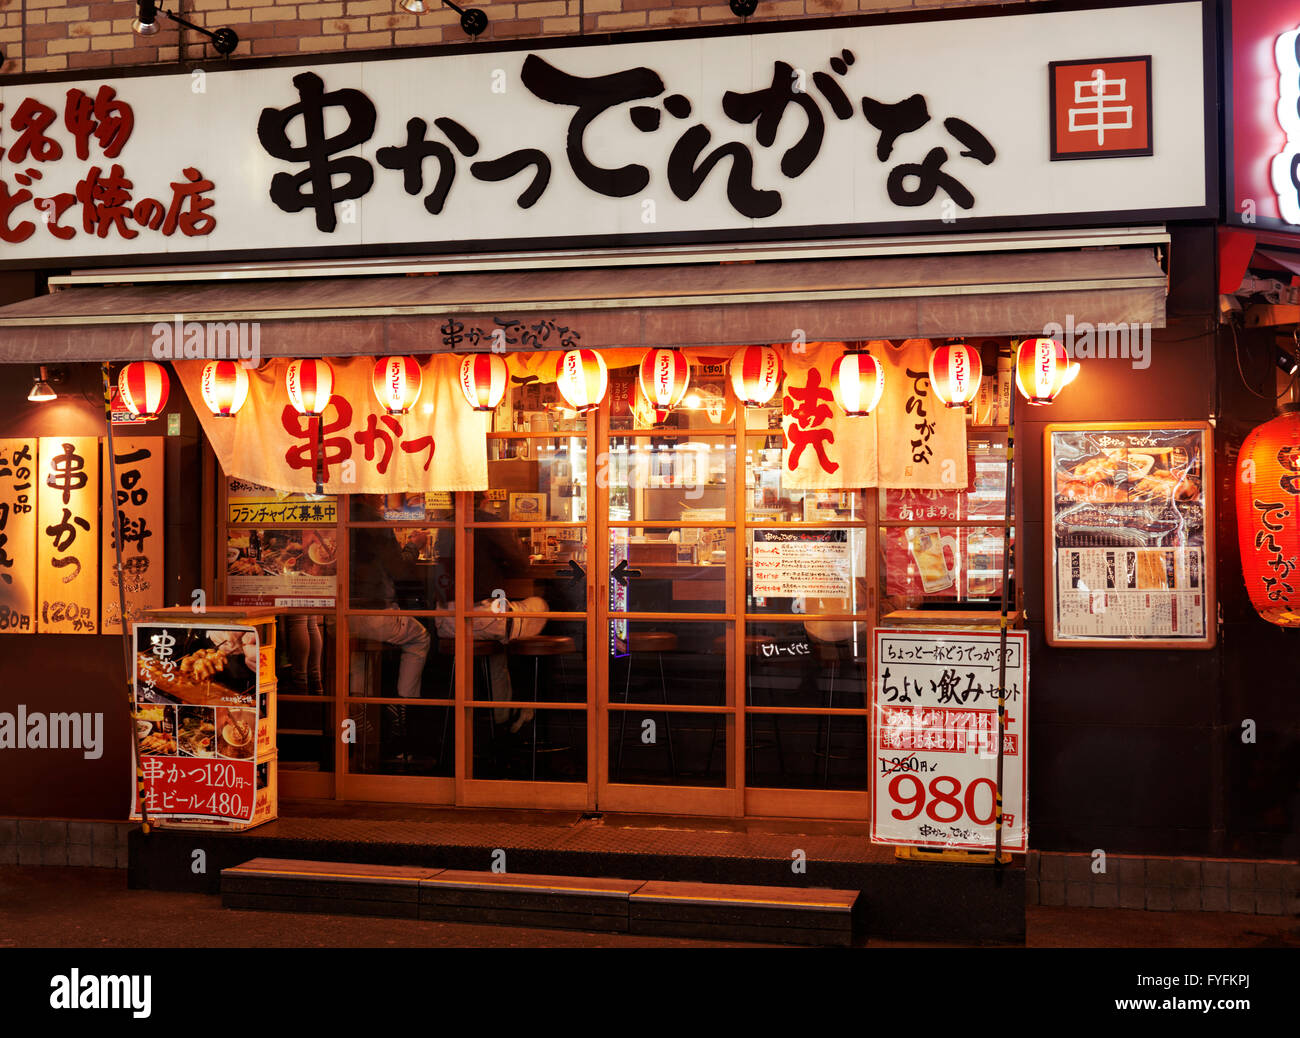 Japanisches Restaurant, Shinjuku, Tokio, Japan Stockbild